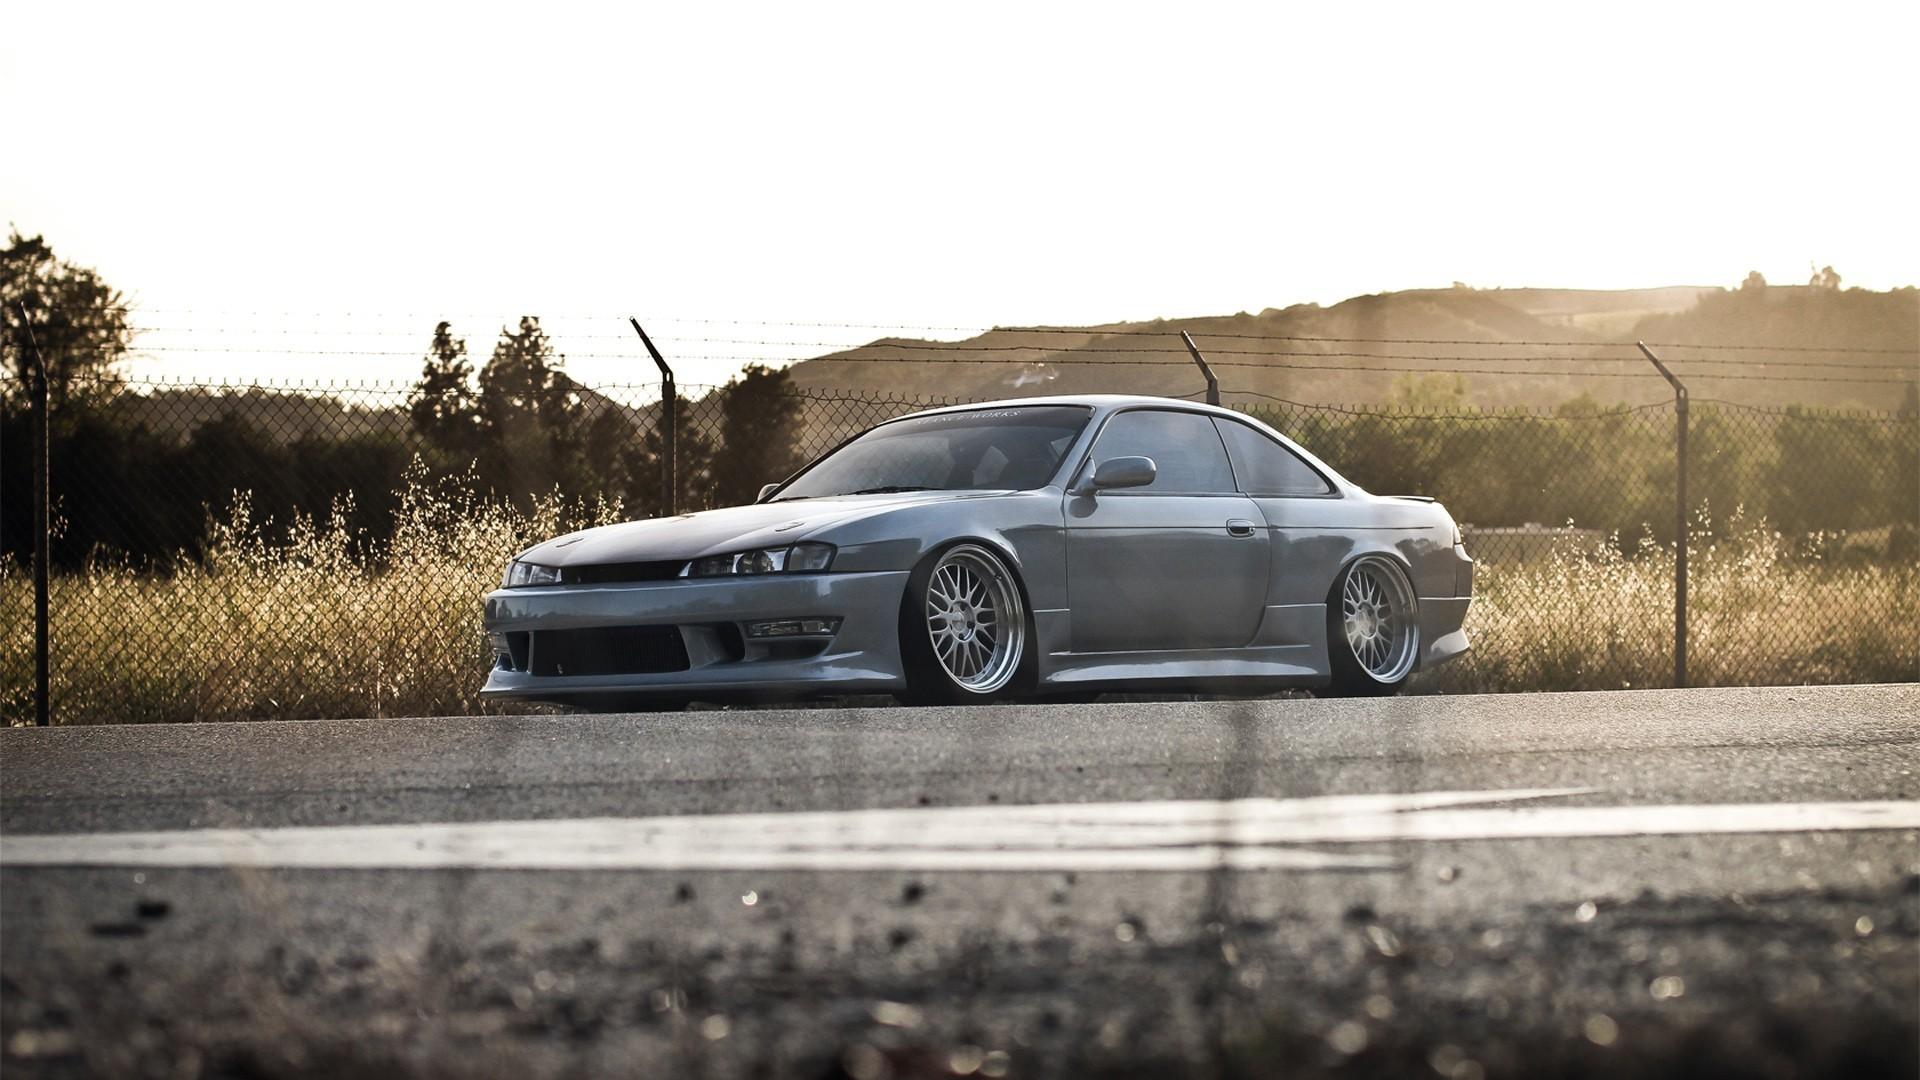 Nissan Silvia S14, Nissan Silvia, Nissan, JDM Wallpapers HD / Desktop and  Mobile Backgrounds